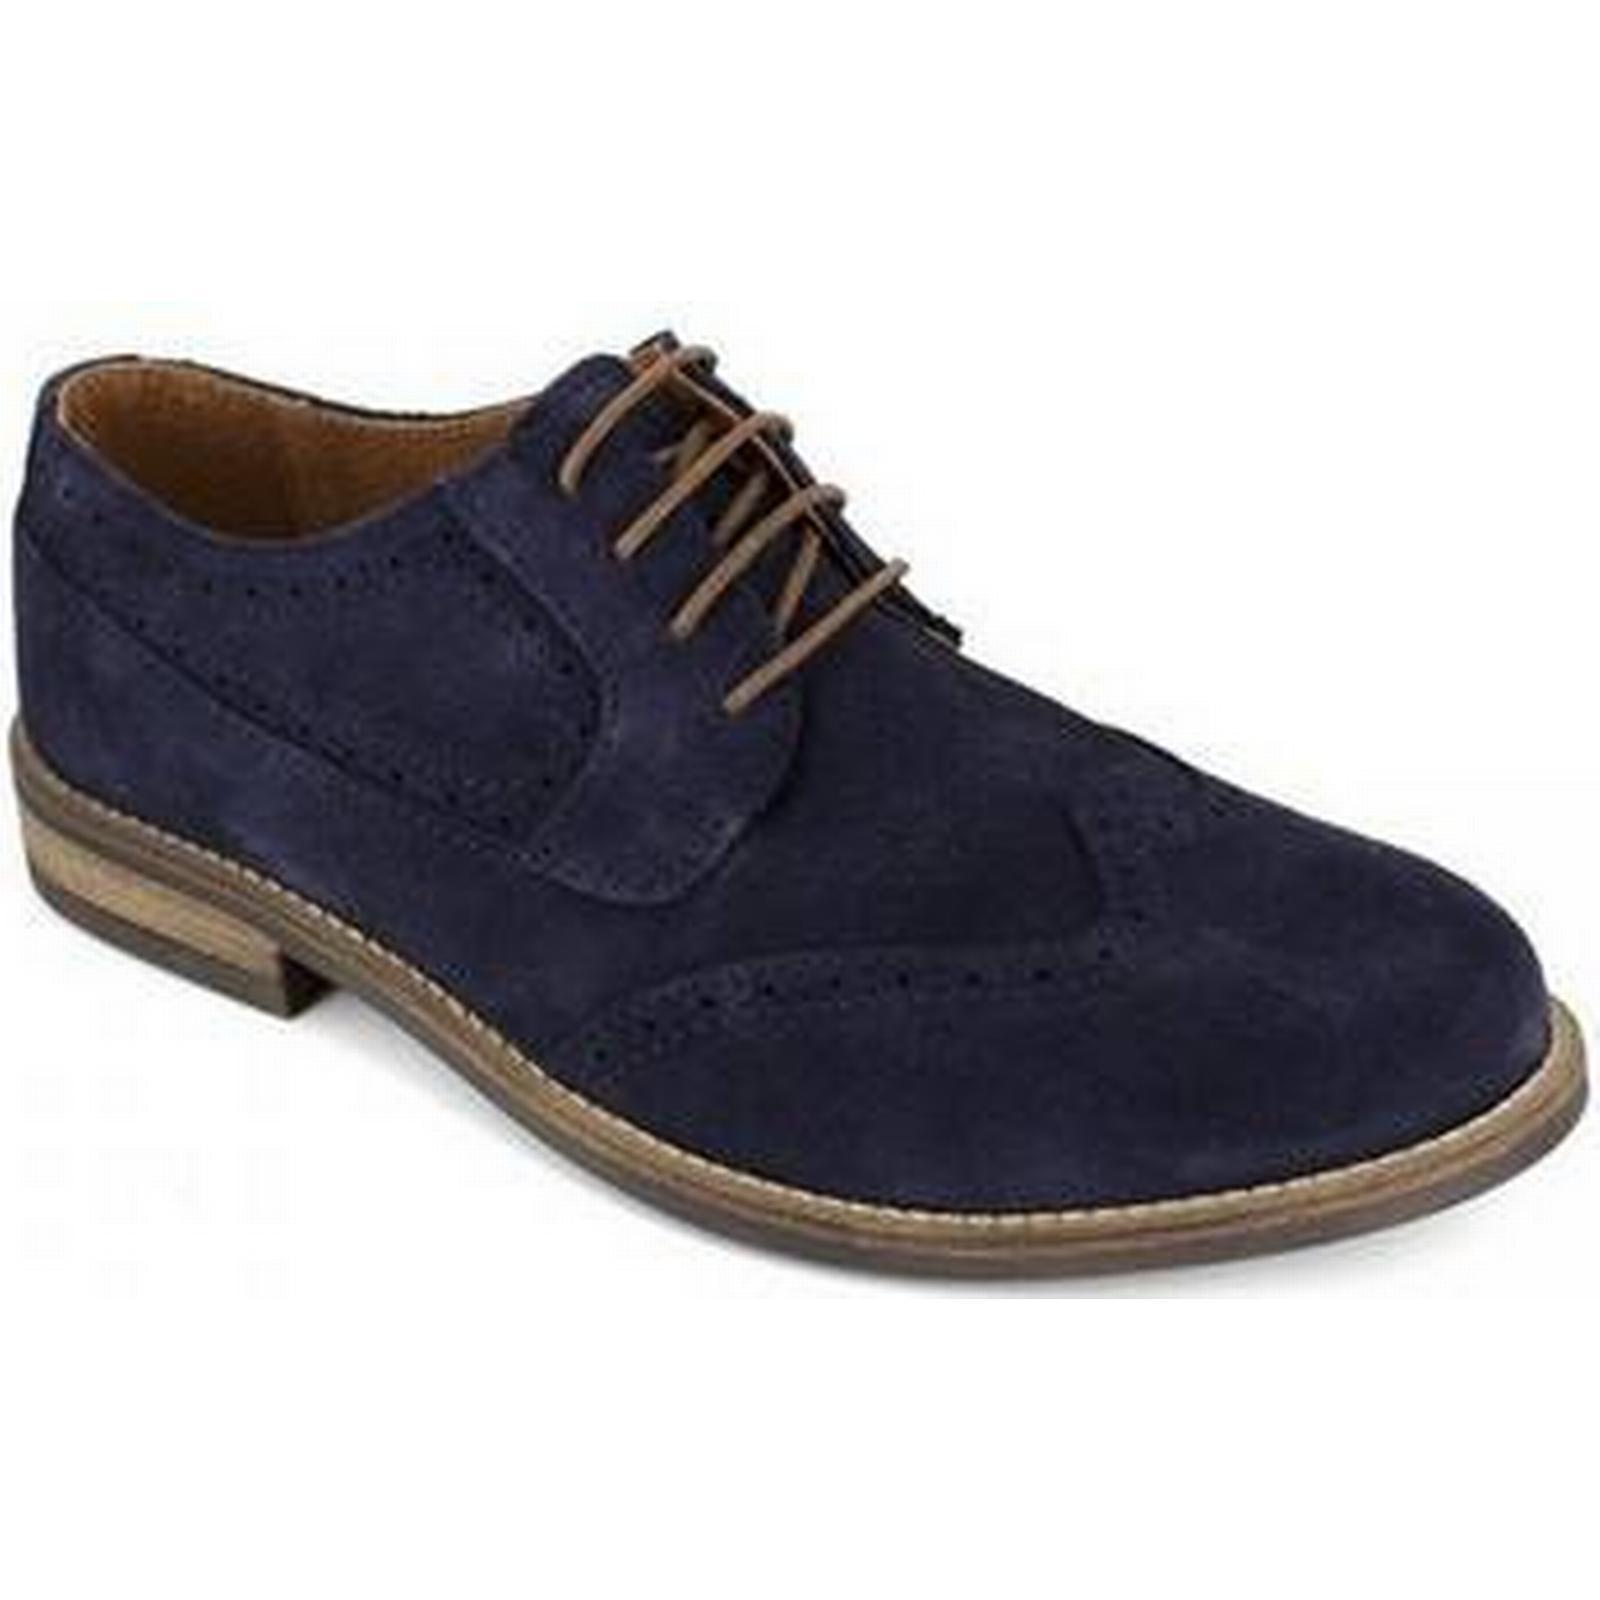 spartoo.co.uk peter blade derby cuir marine hommes & s # risti  ; s & souliers en bleu f9643d